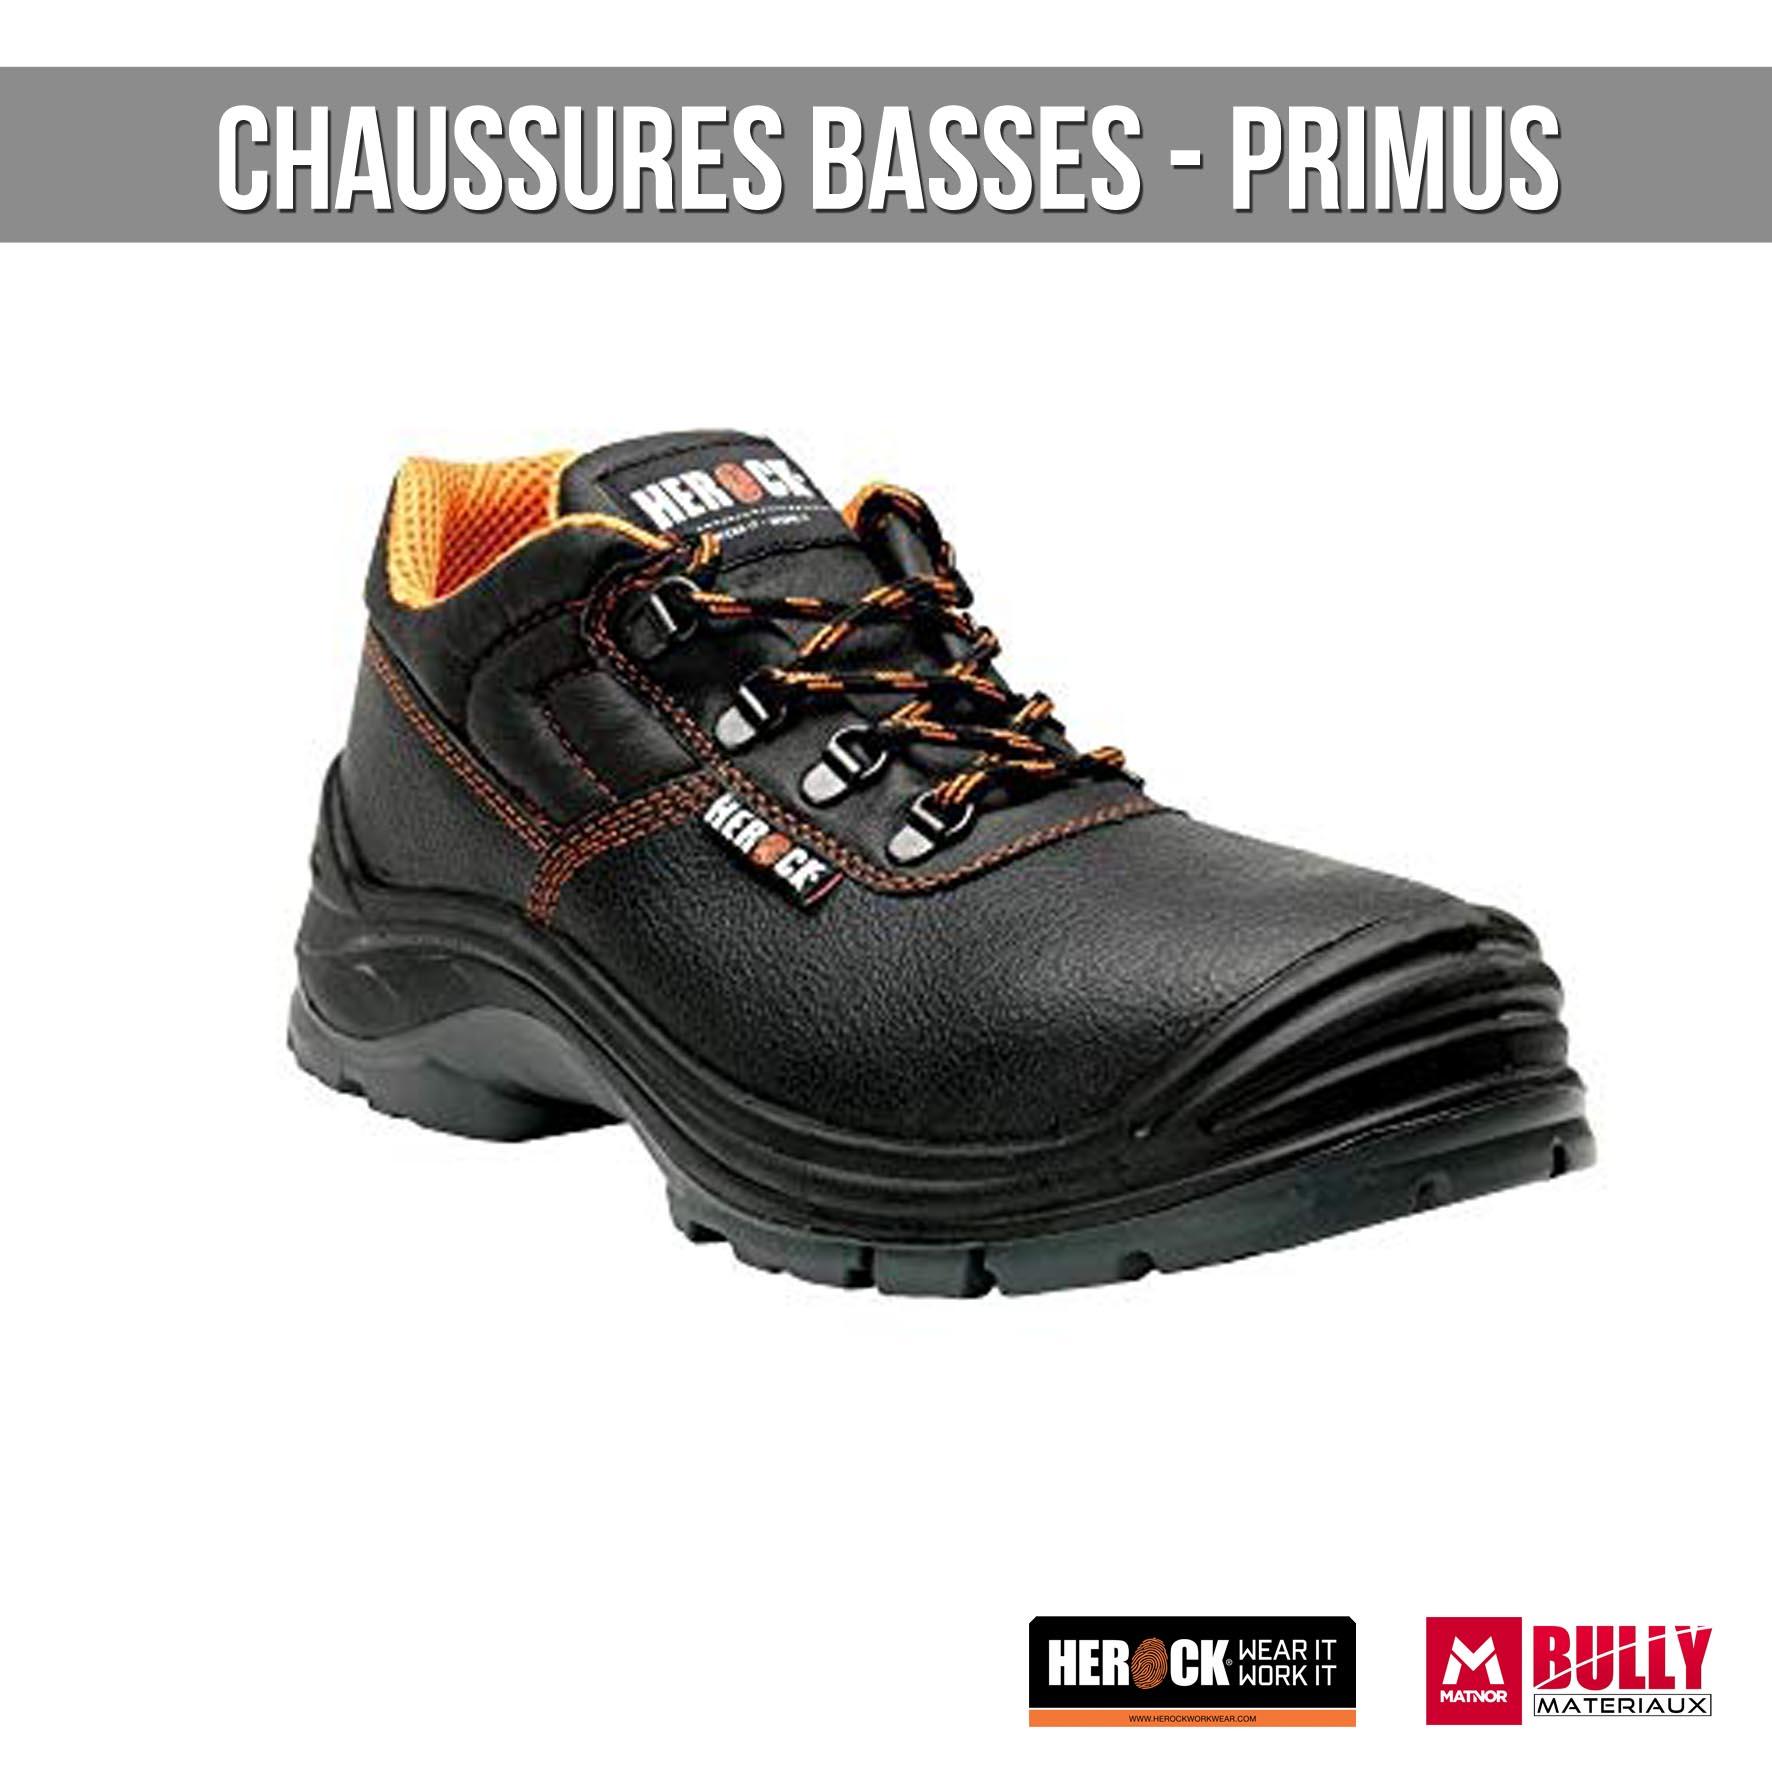 Chaussure primus